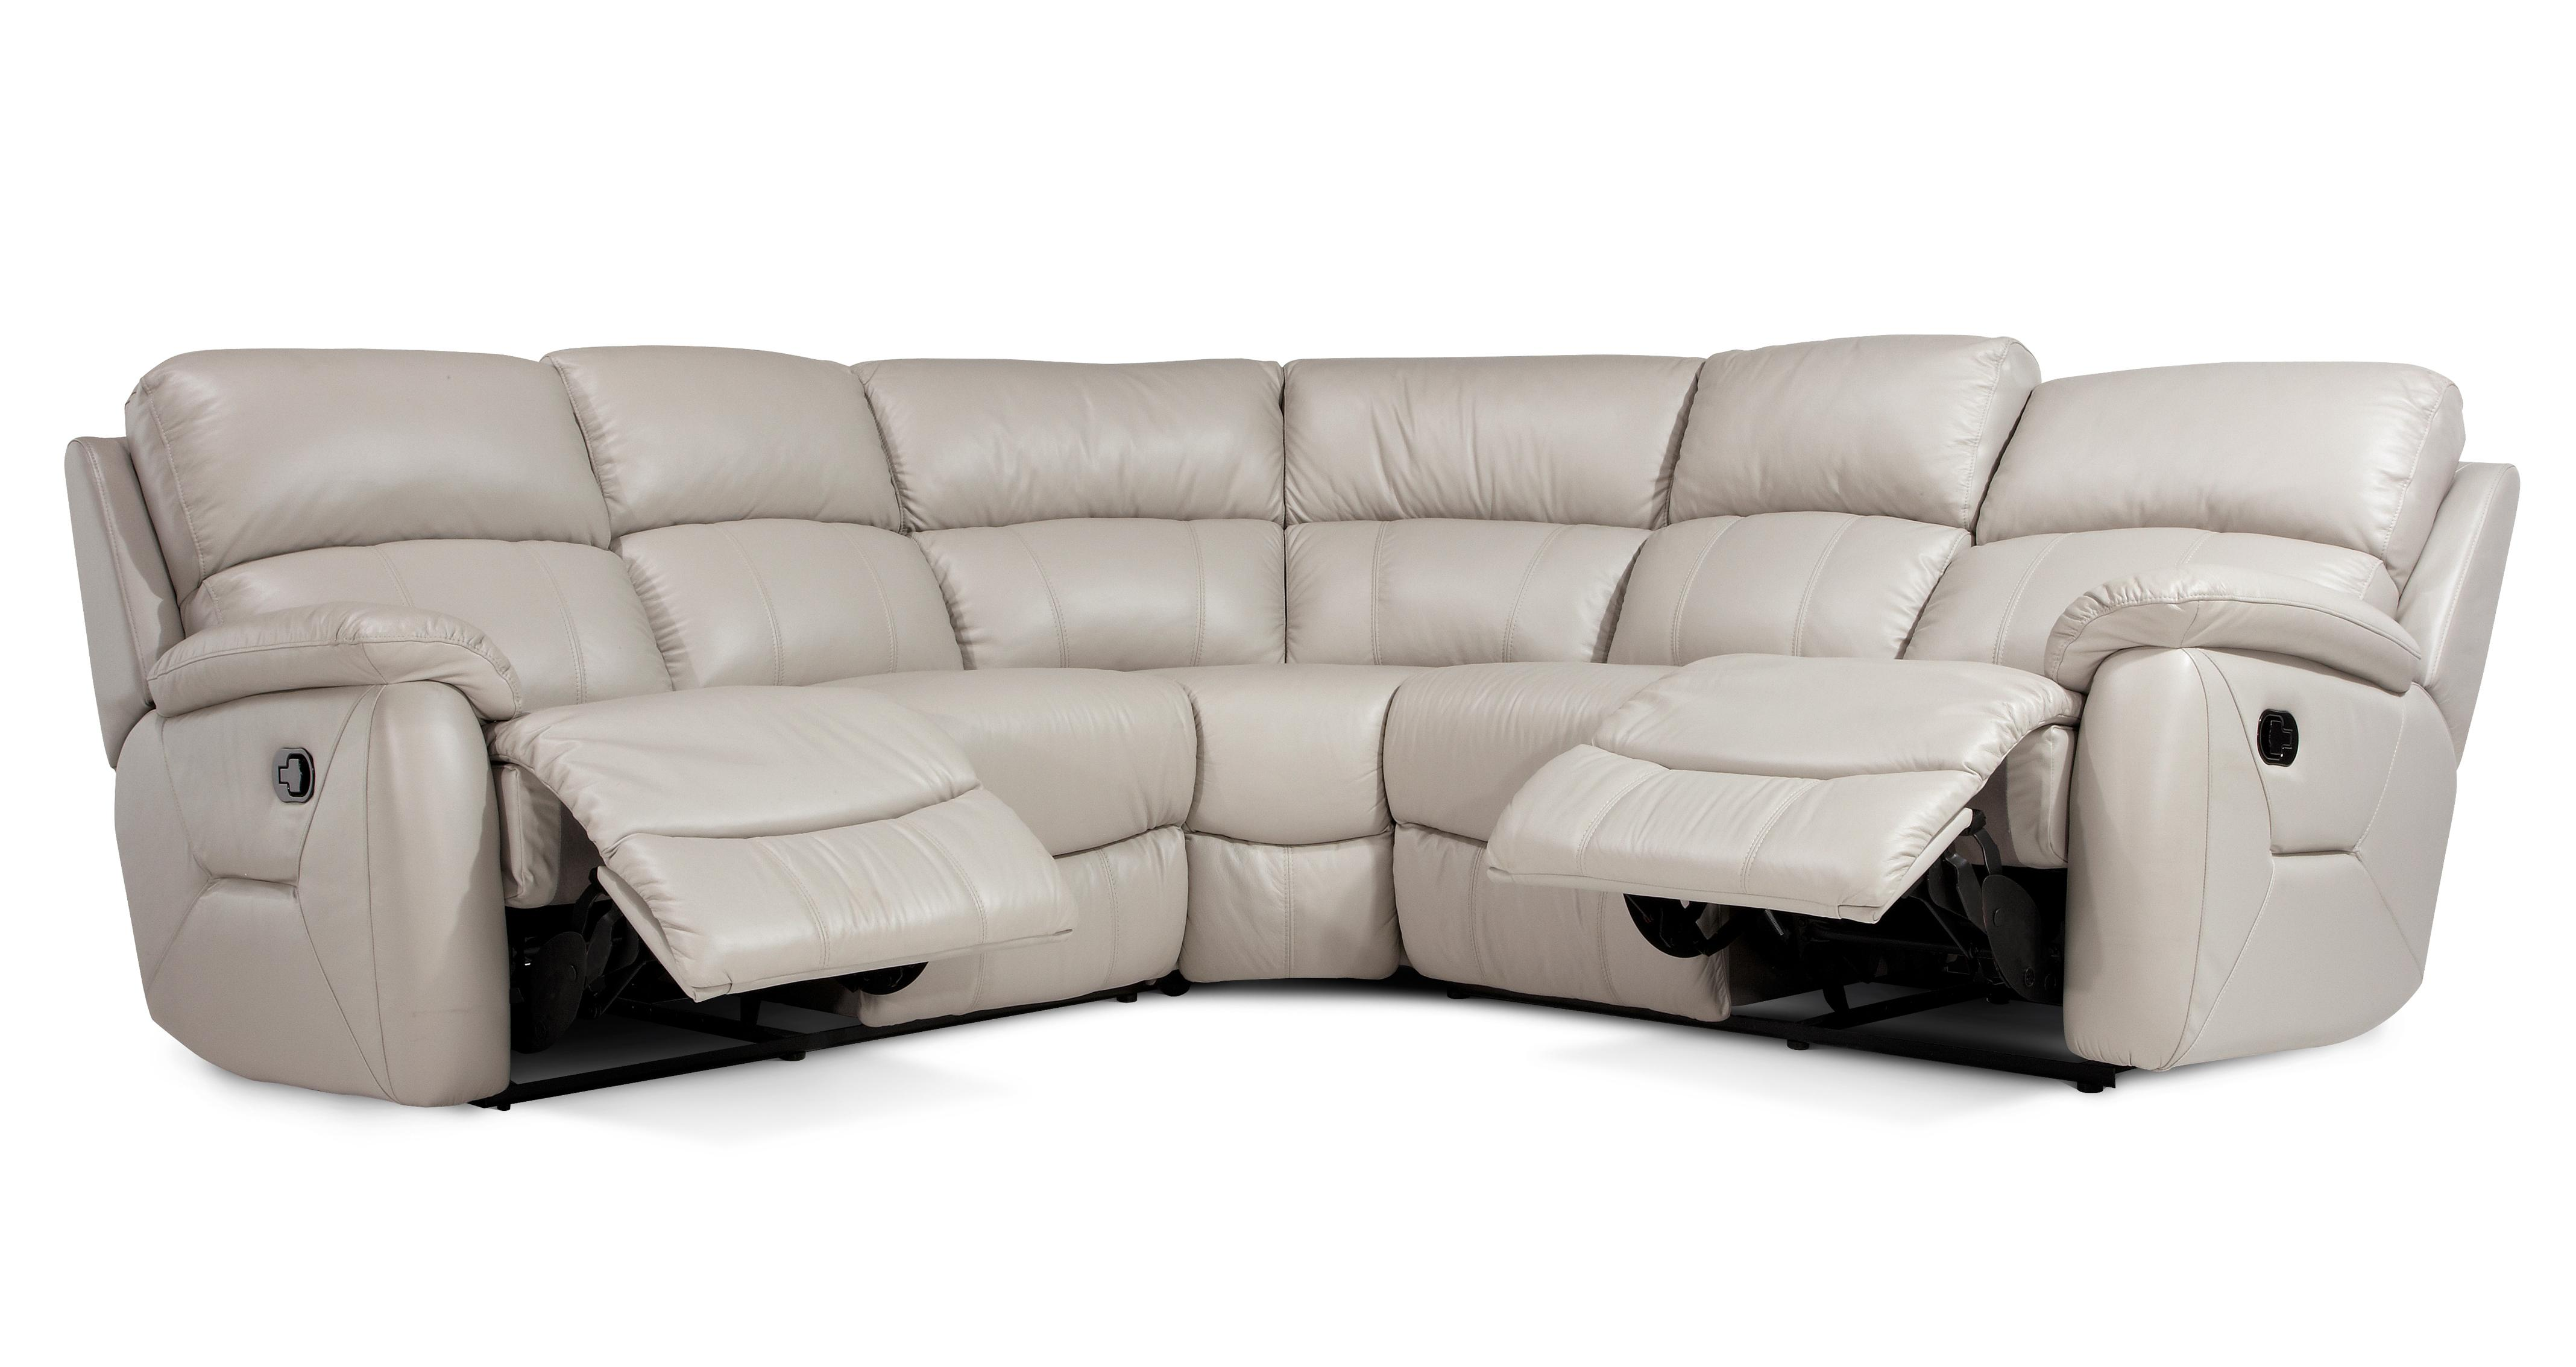 dfs navona sofa reviews sets furniture option c 2 43c 432 manual peru